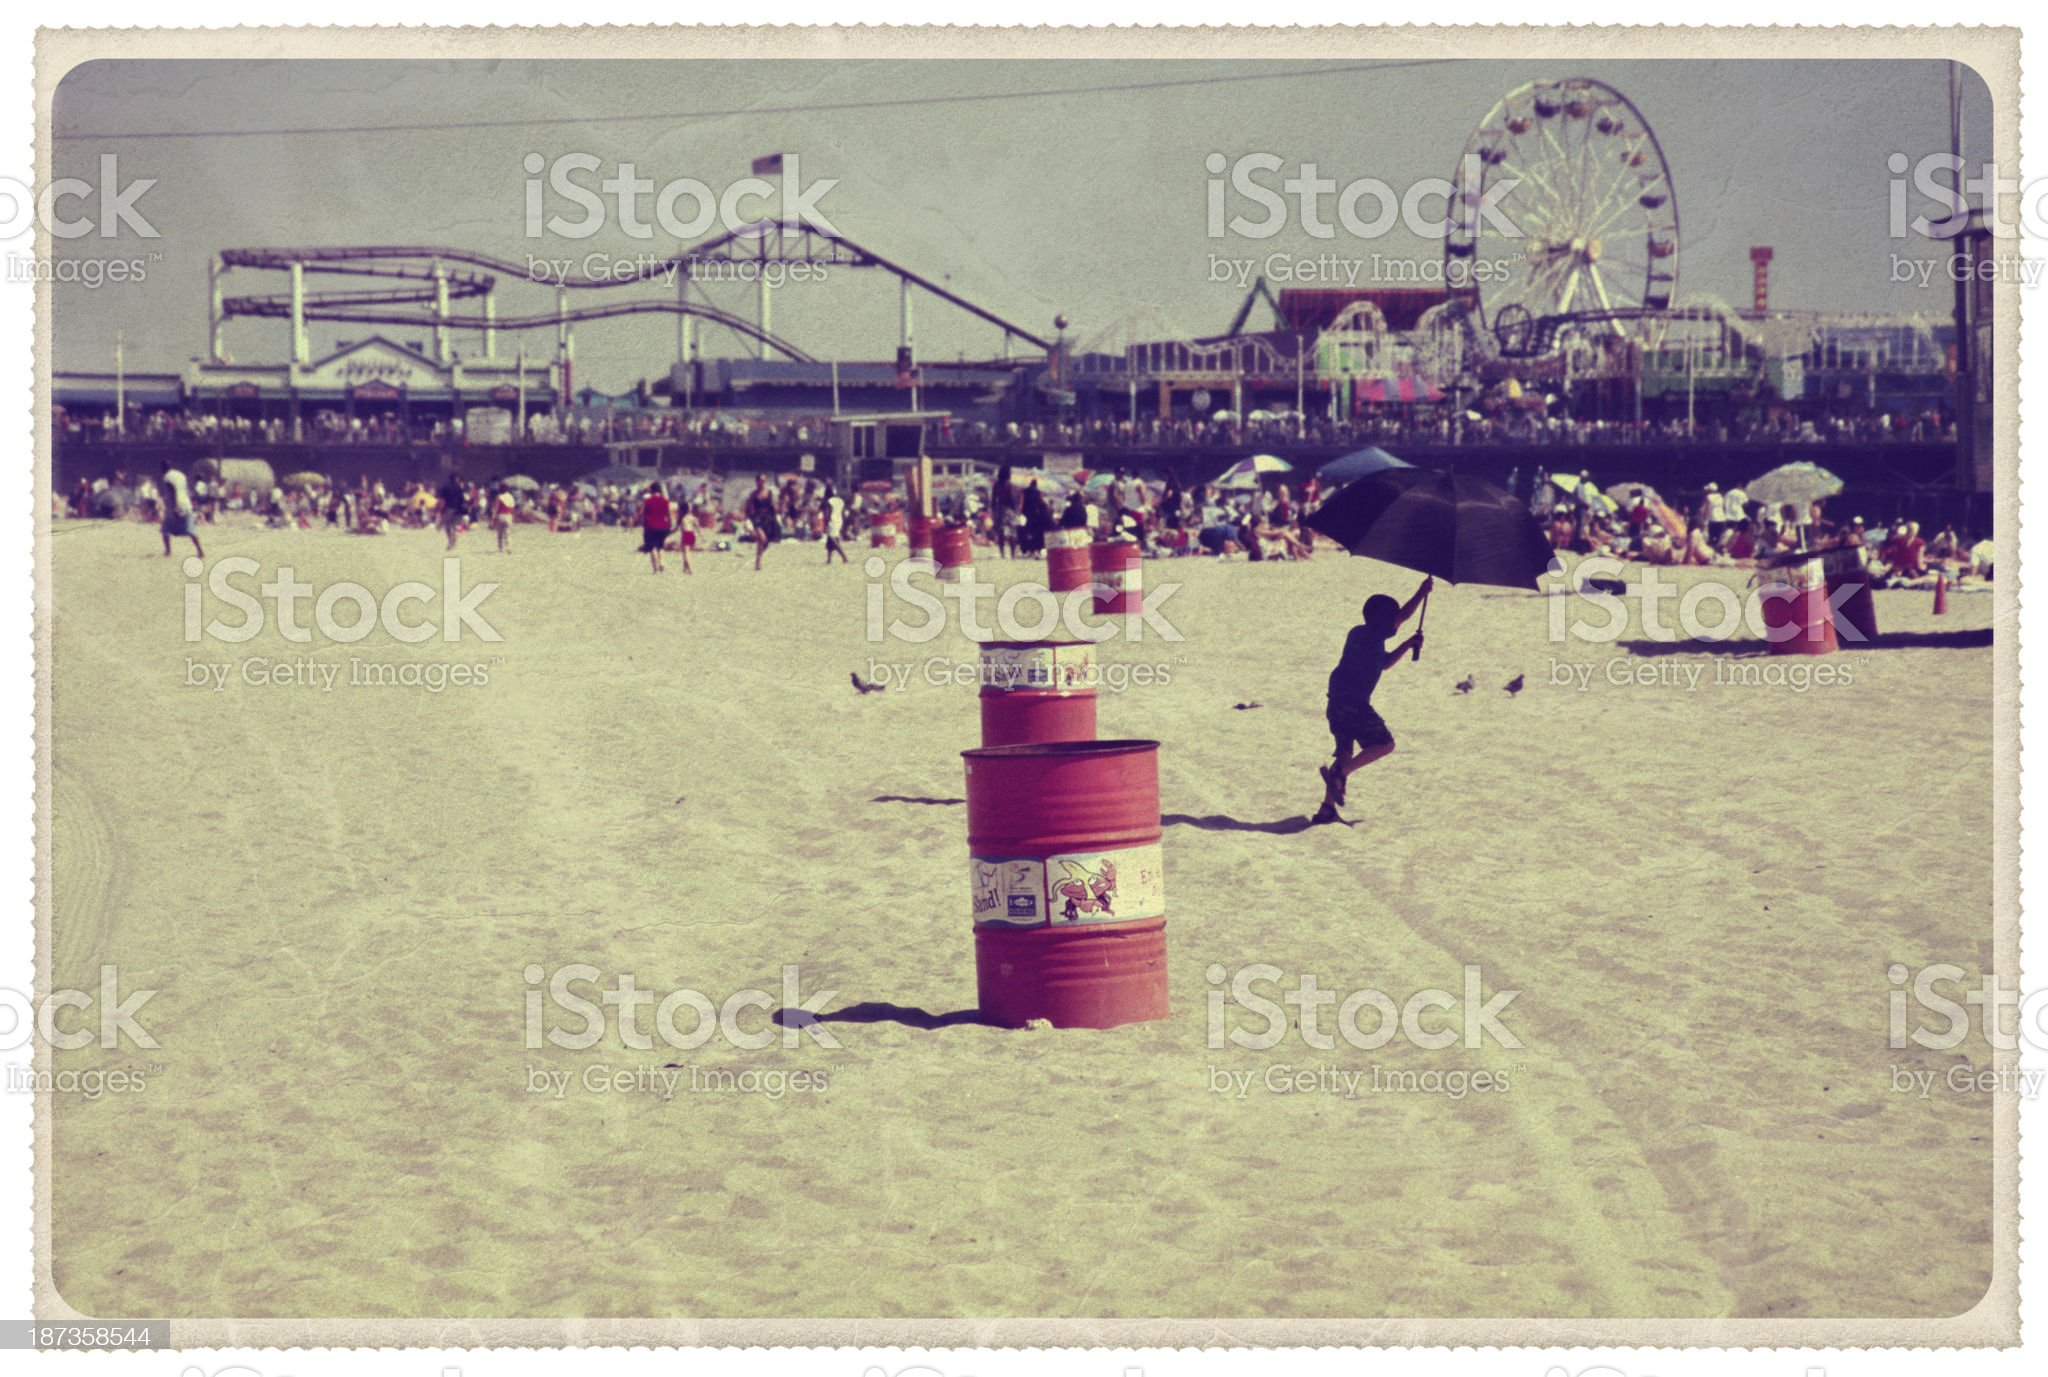 Santa Monica Pier - Vintage Postcard royalty-free stock photo